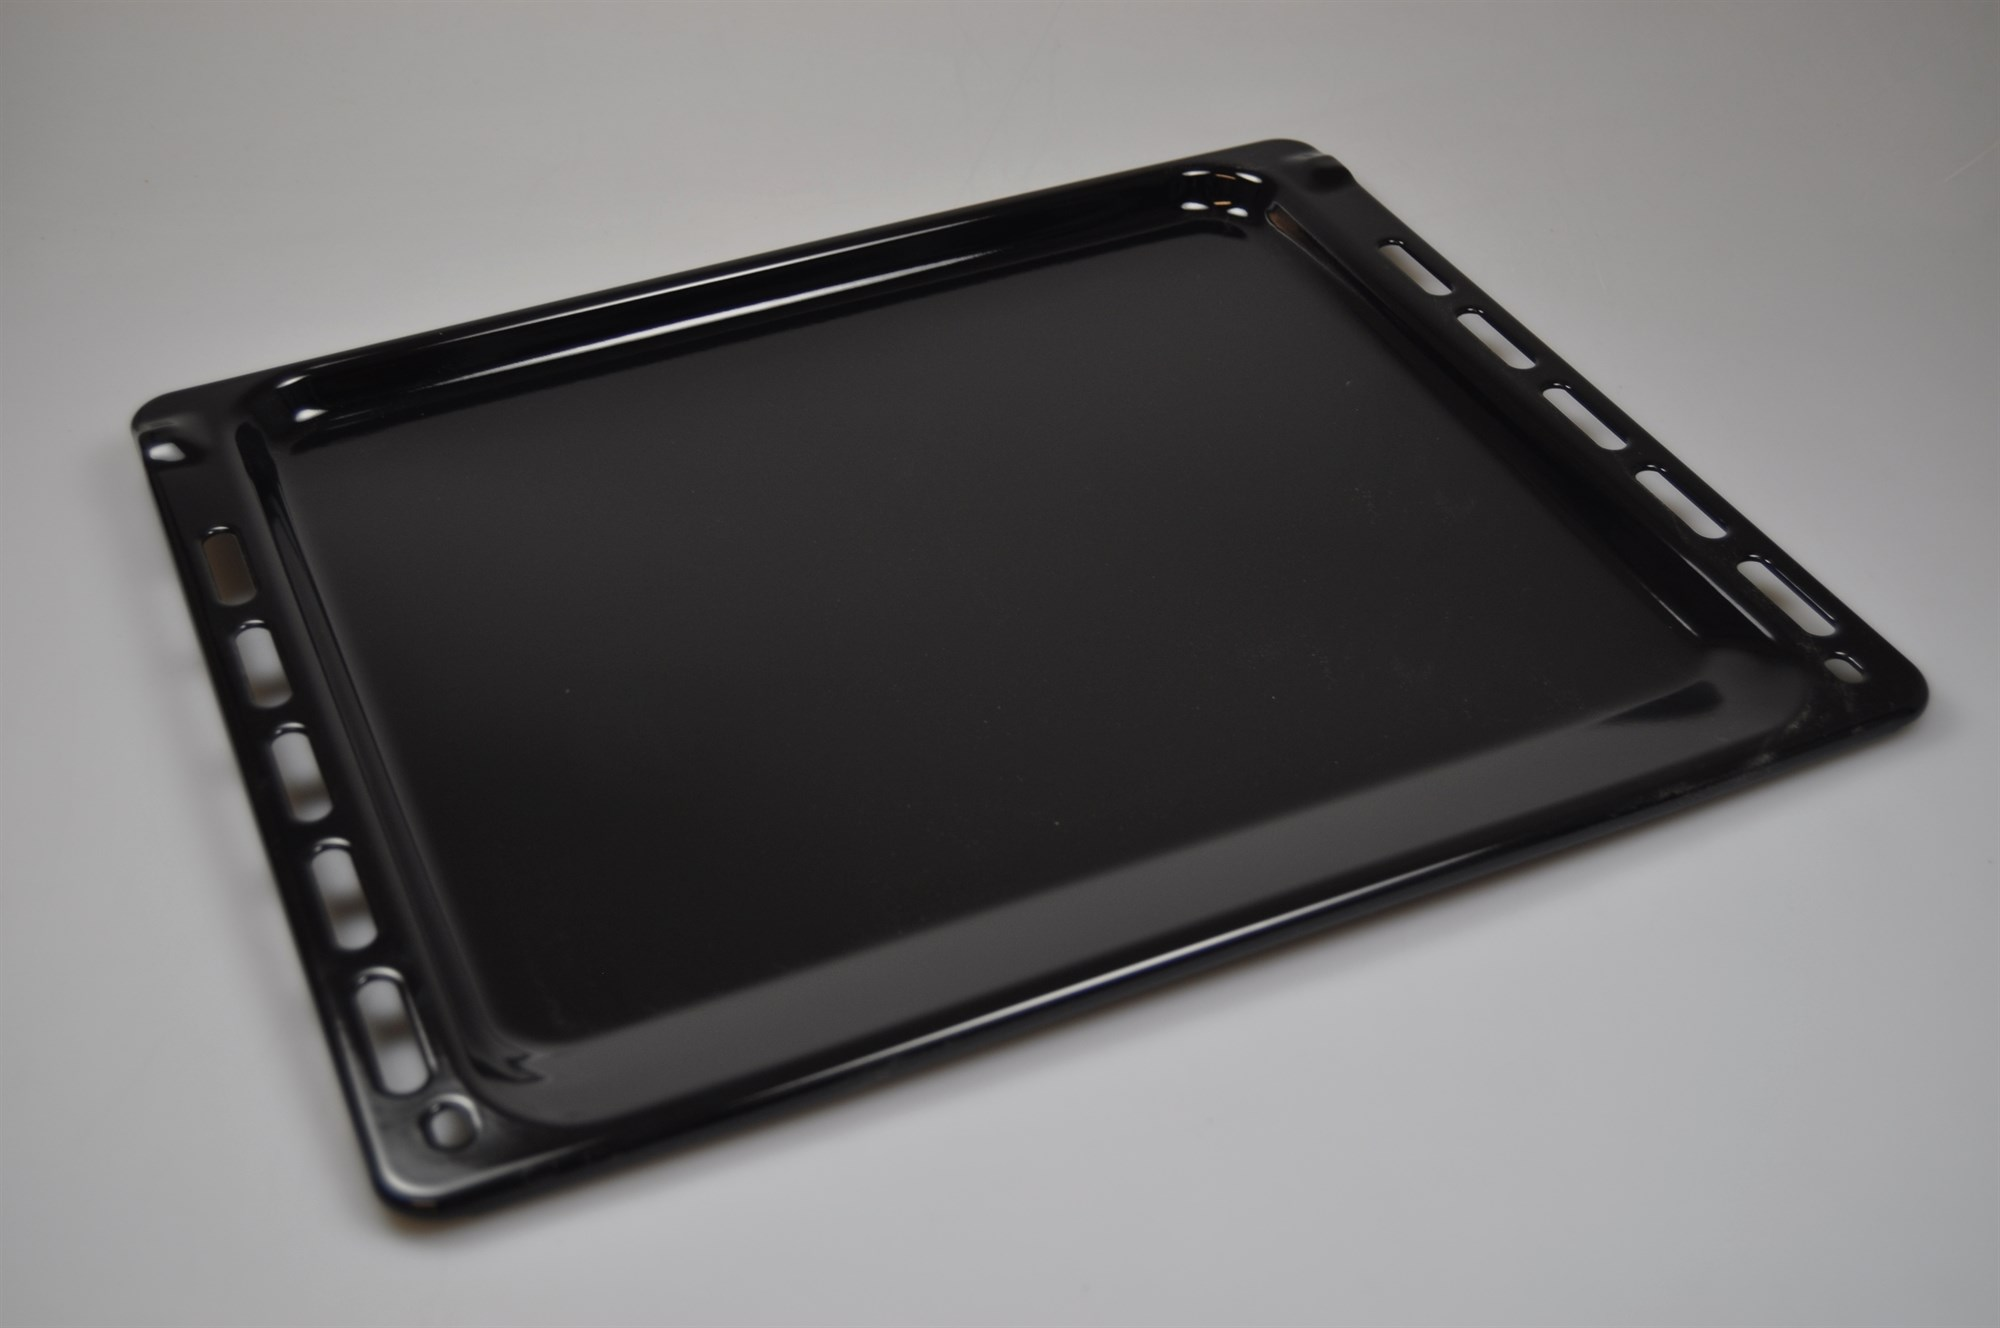 Baking Tray Ikea Whirlpool Cooker Amp Hob 17 Mm X 445 Mm